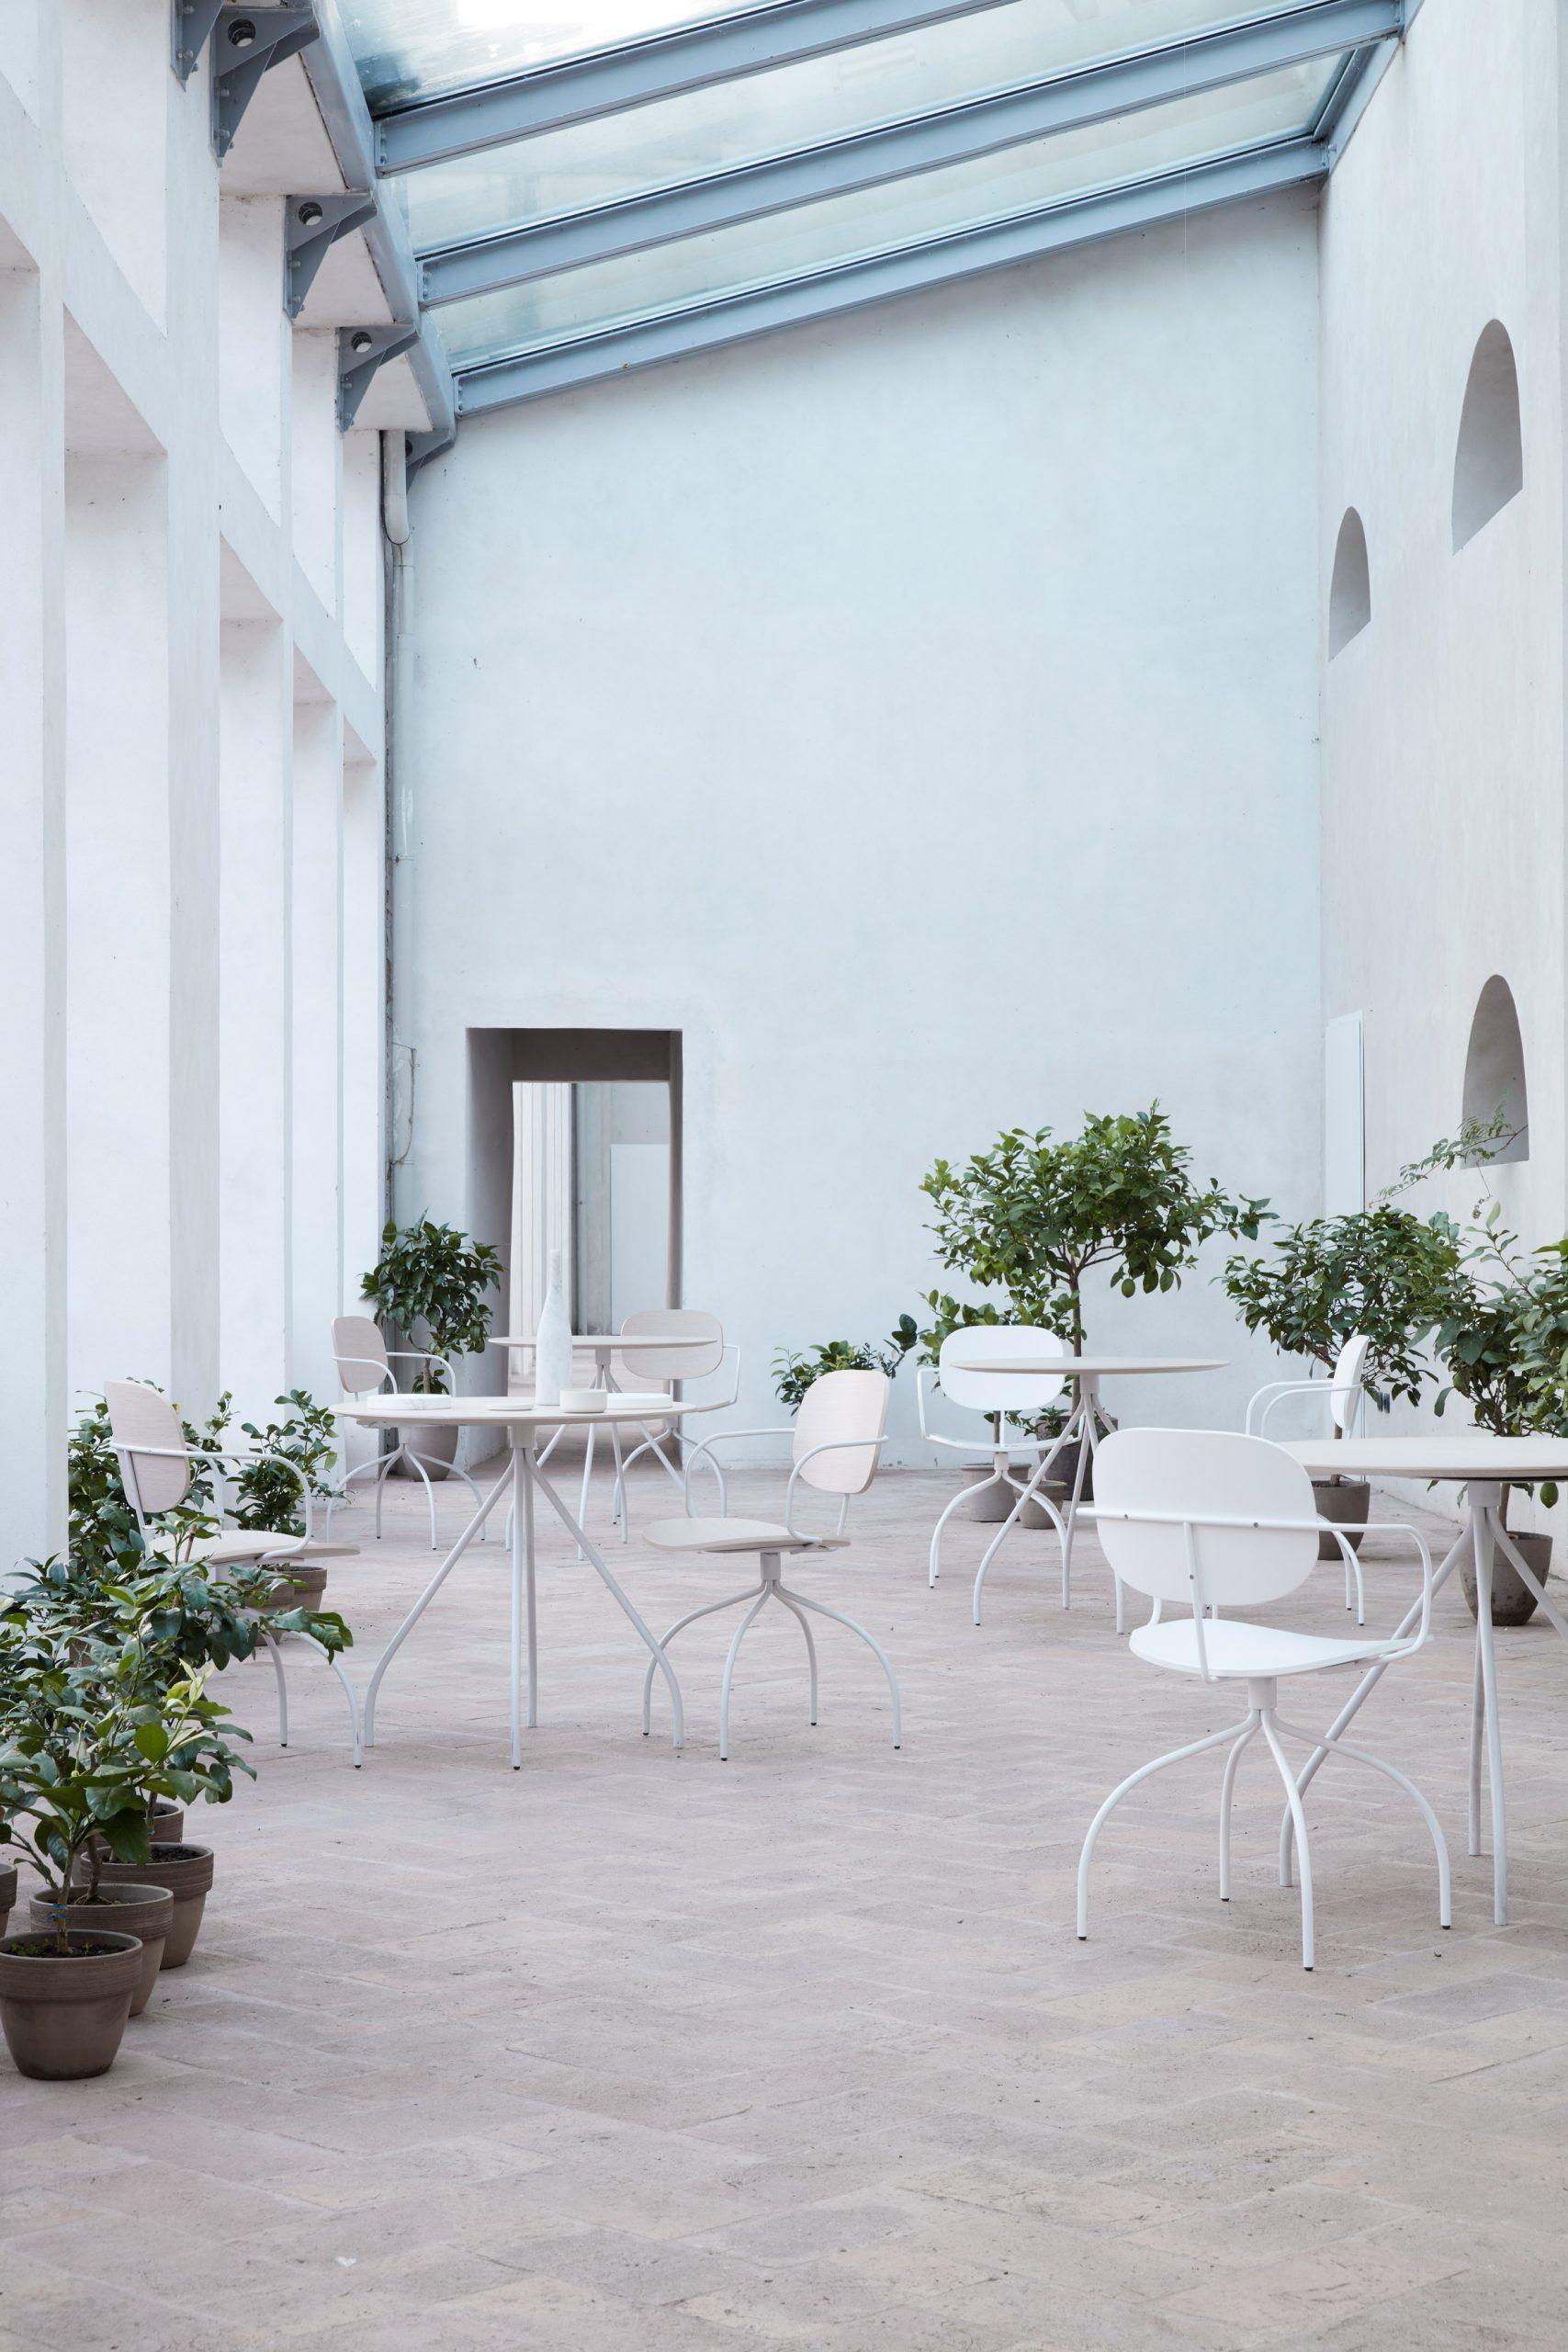 Magenta chair by Raffaella Mangiarotti for IOC Project Partners